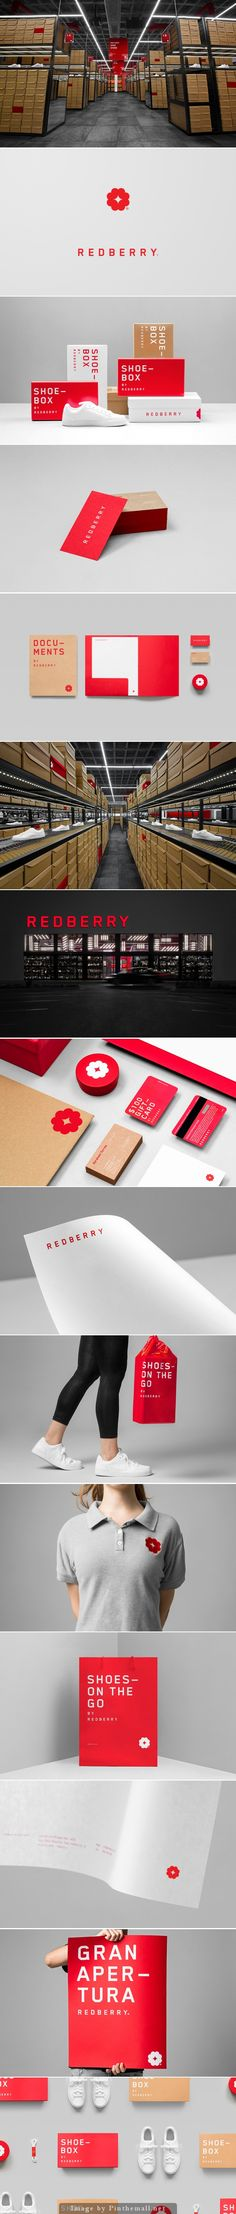 Anagrama - Redberry